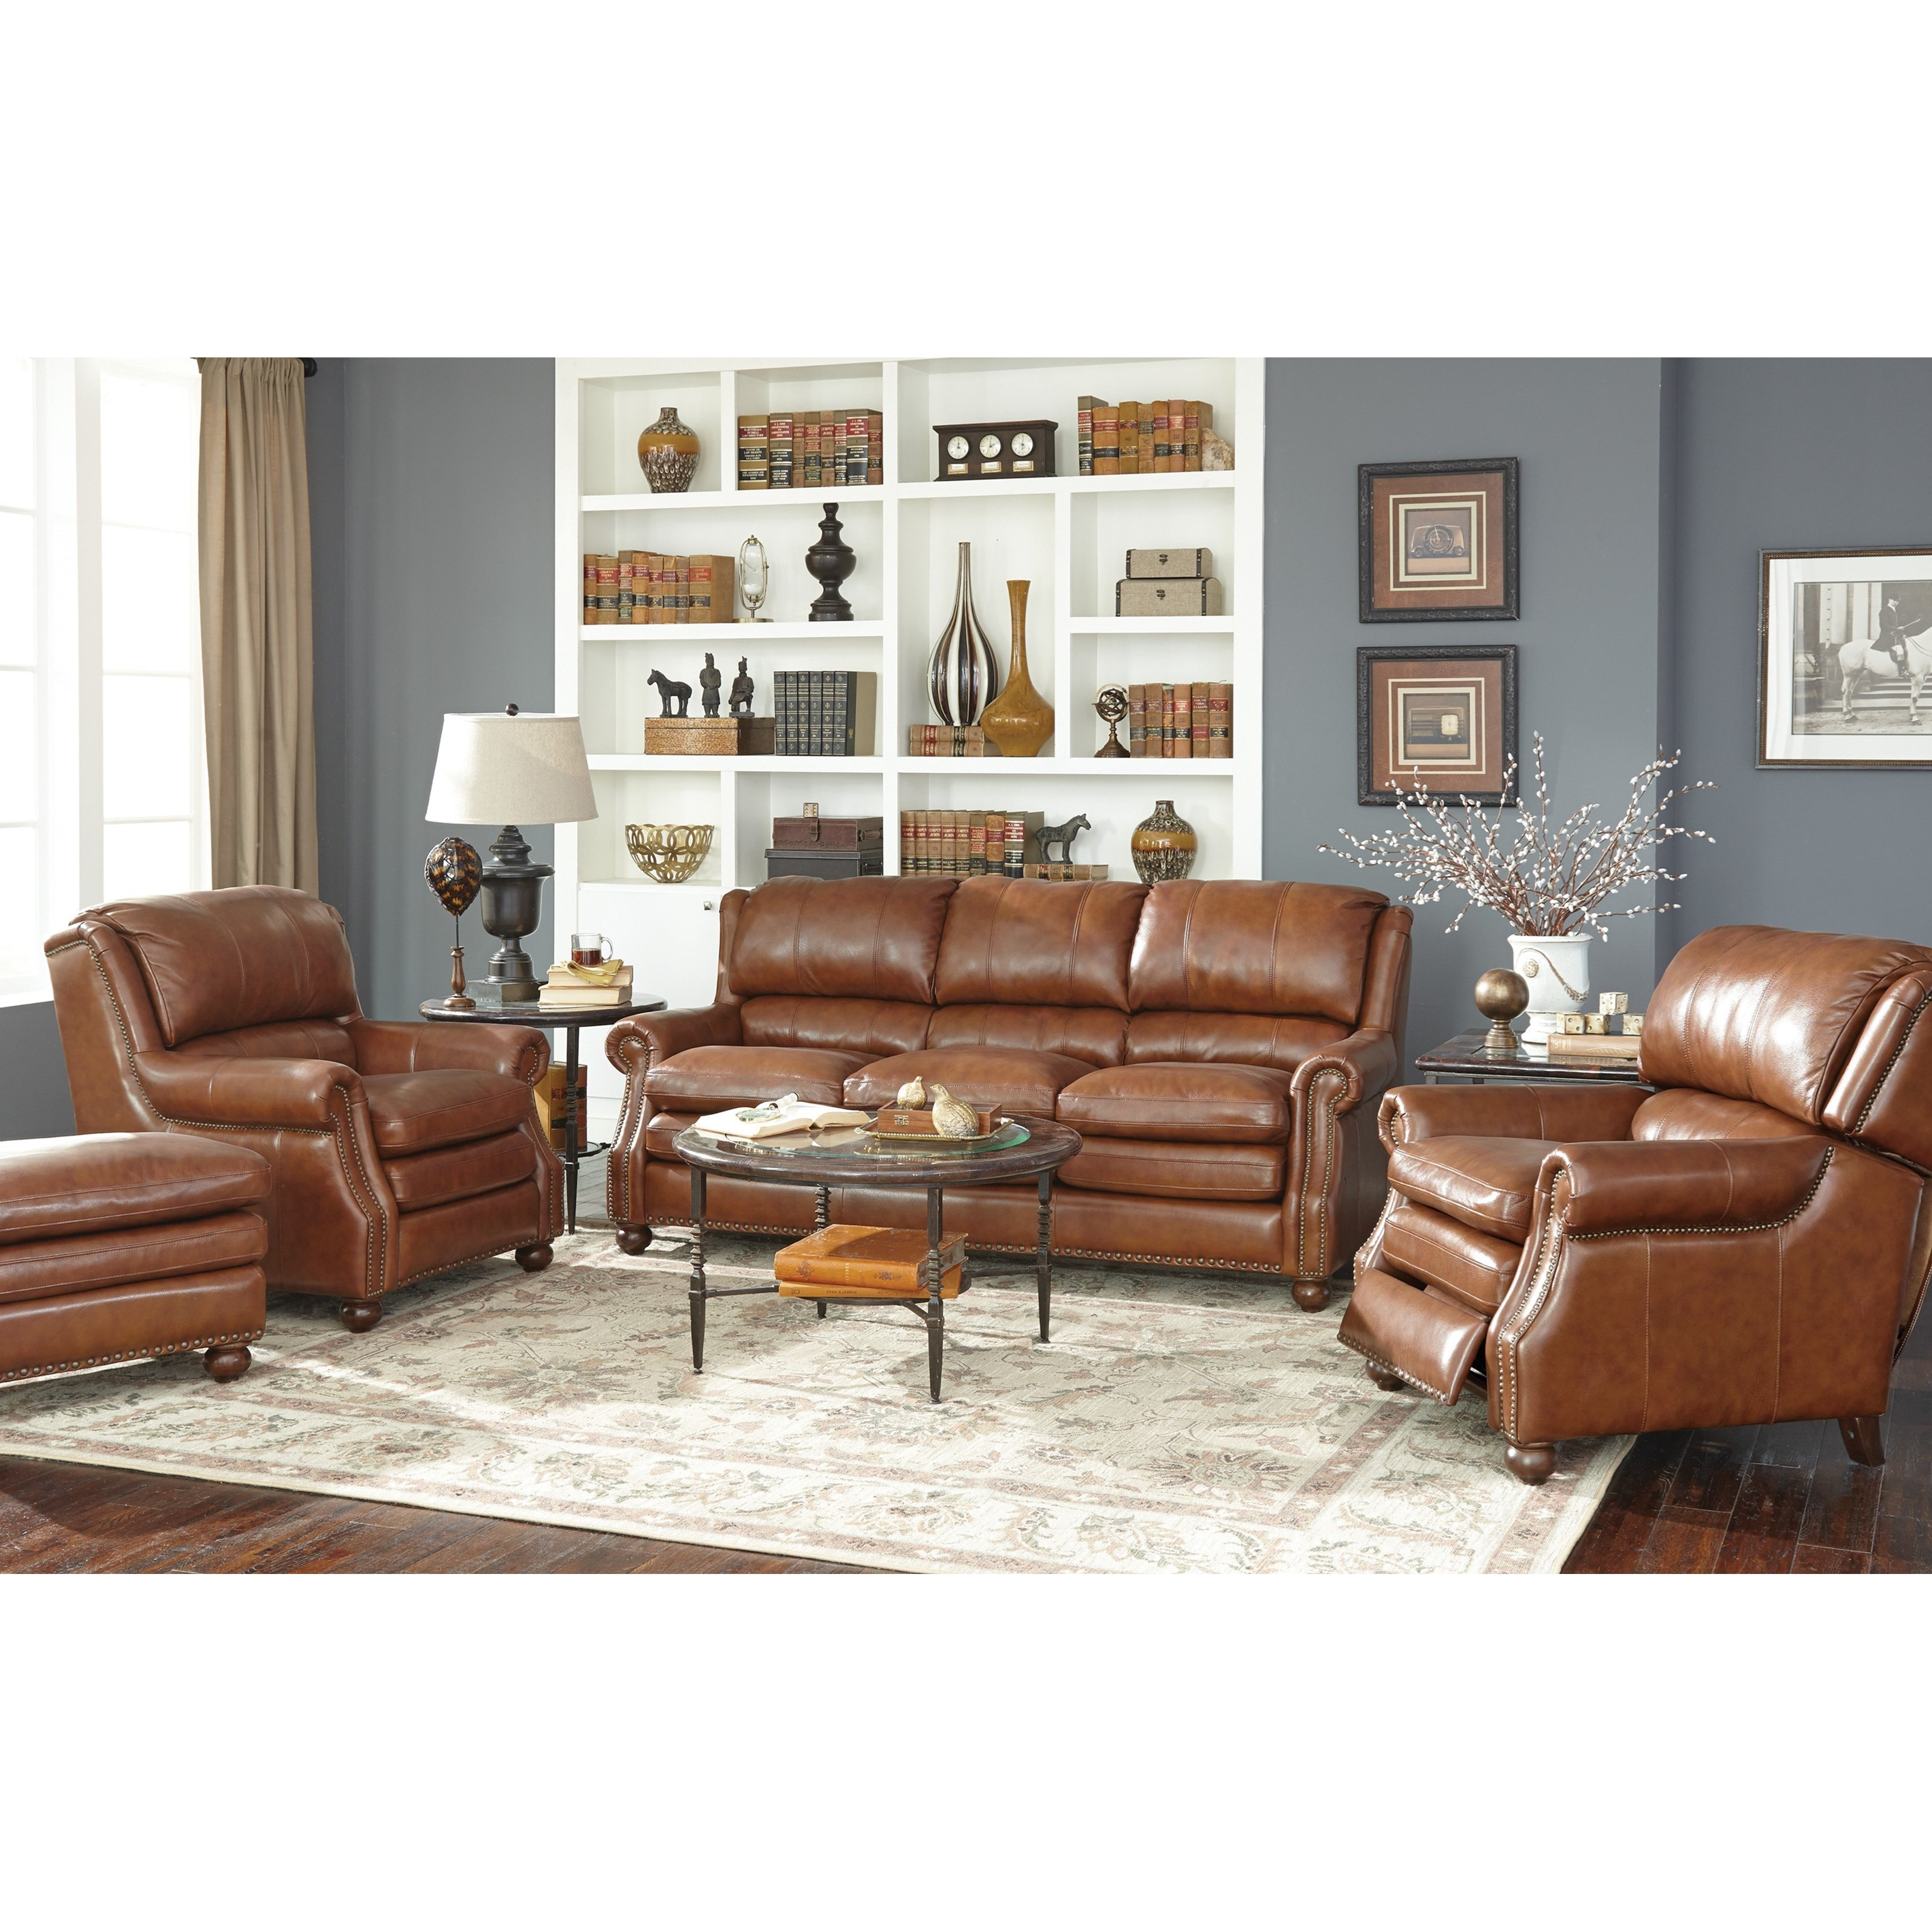 Craftmaster L1646 Living Room Group Jacksonville Furniture Mart Stationary Living Room Groups